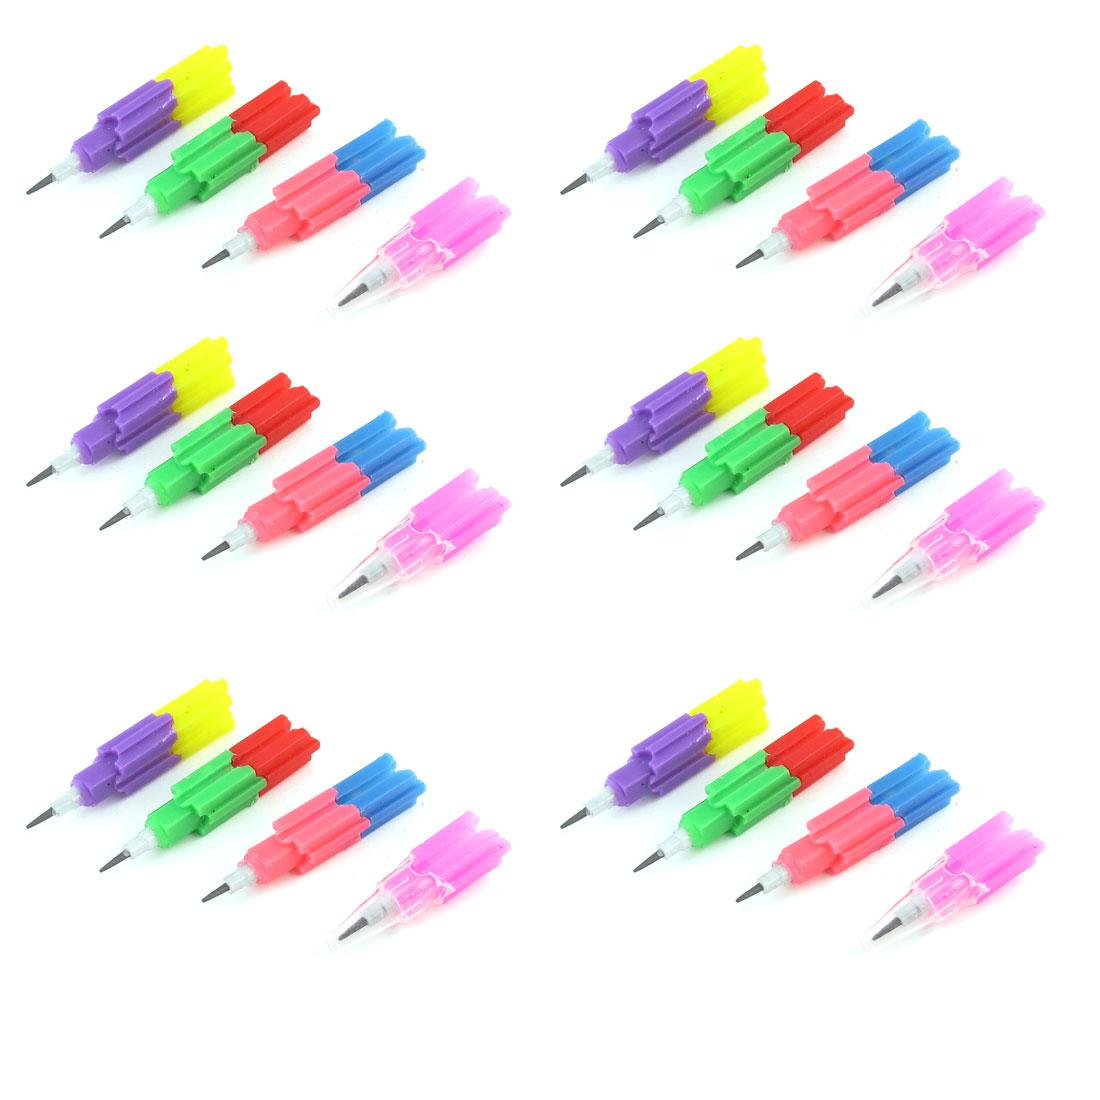 42 Pcs Pink Red Green Plastic Bricks Block Design Mini Pencils Toy for Kids